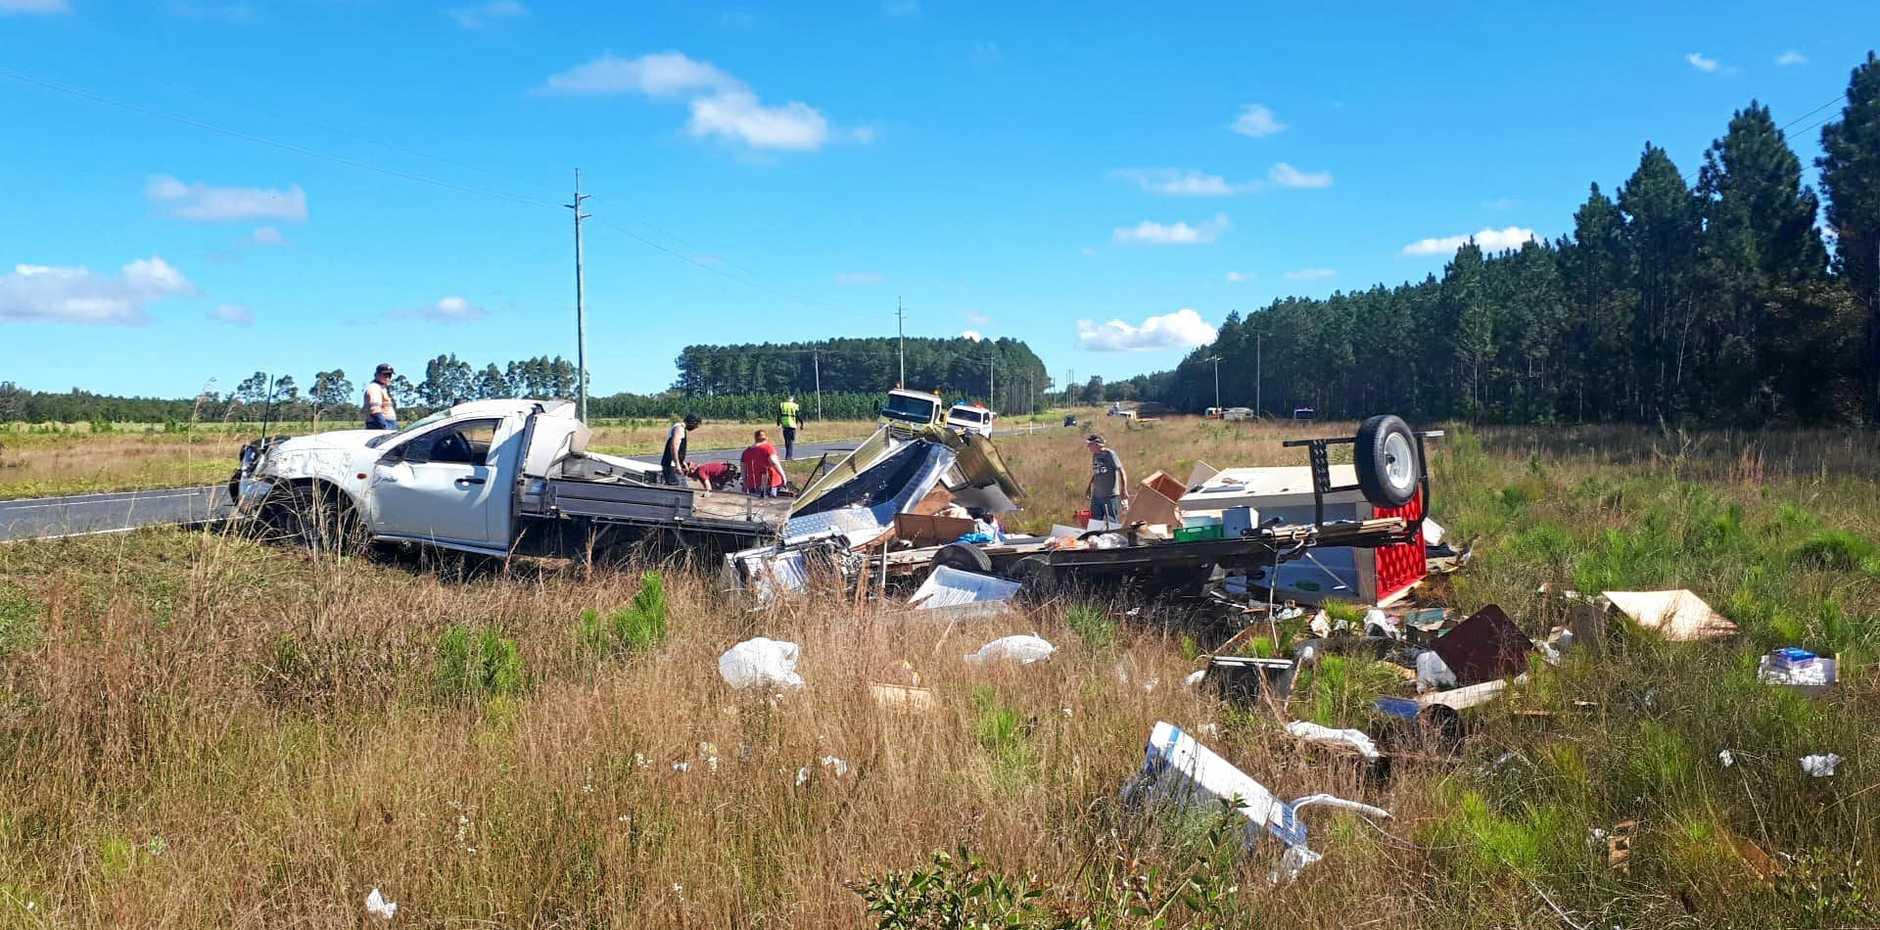 A ute towing a caravan has come to grief on the Tin Can Bay Rd near Tinana.